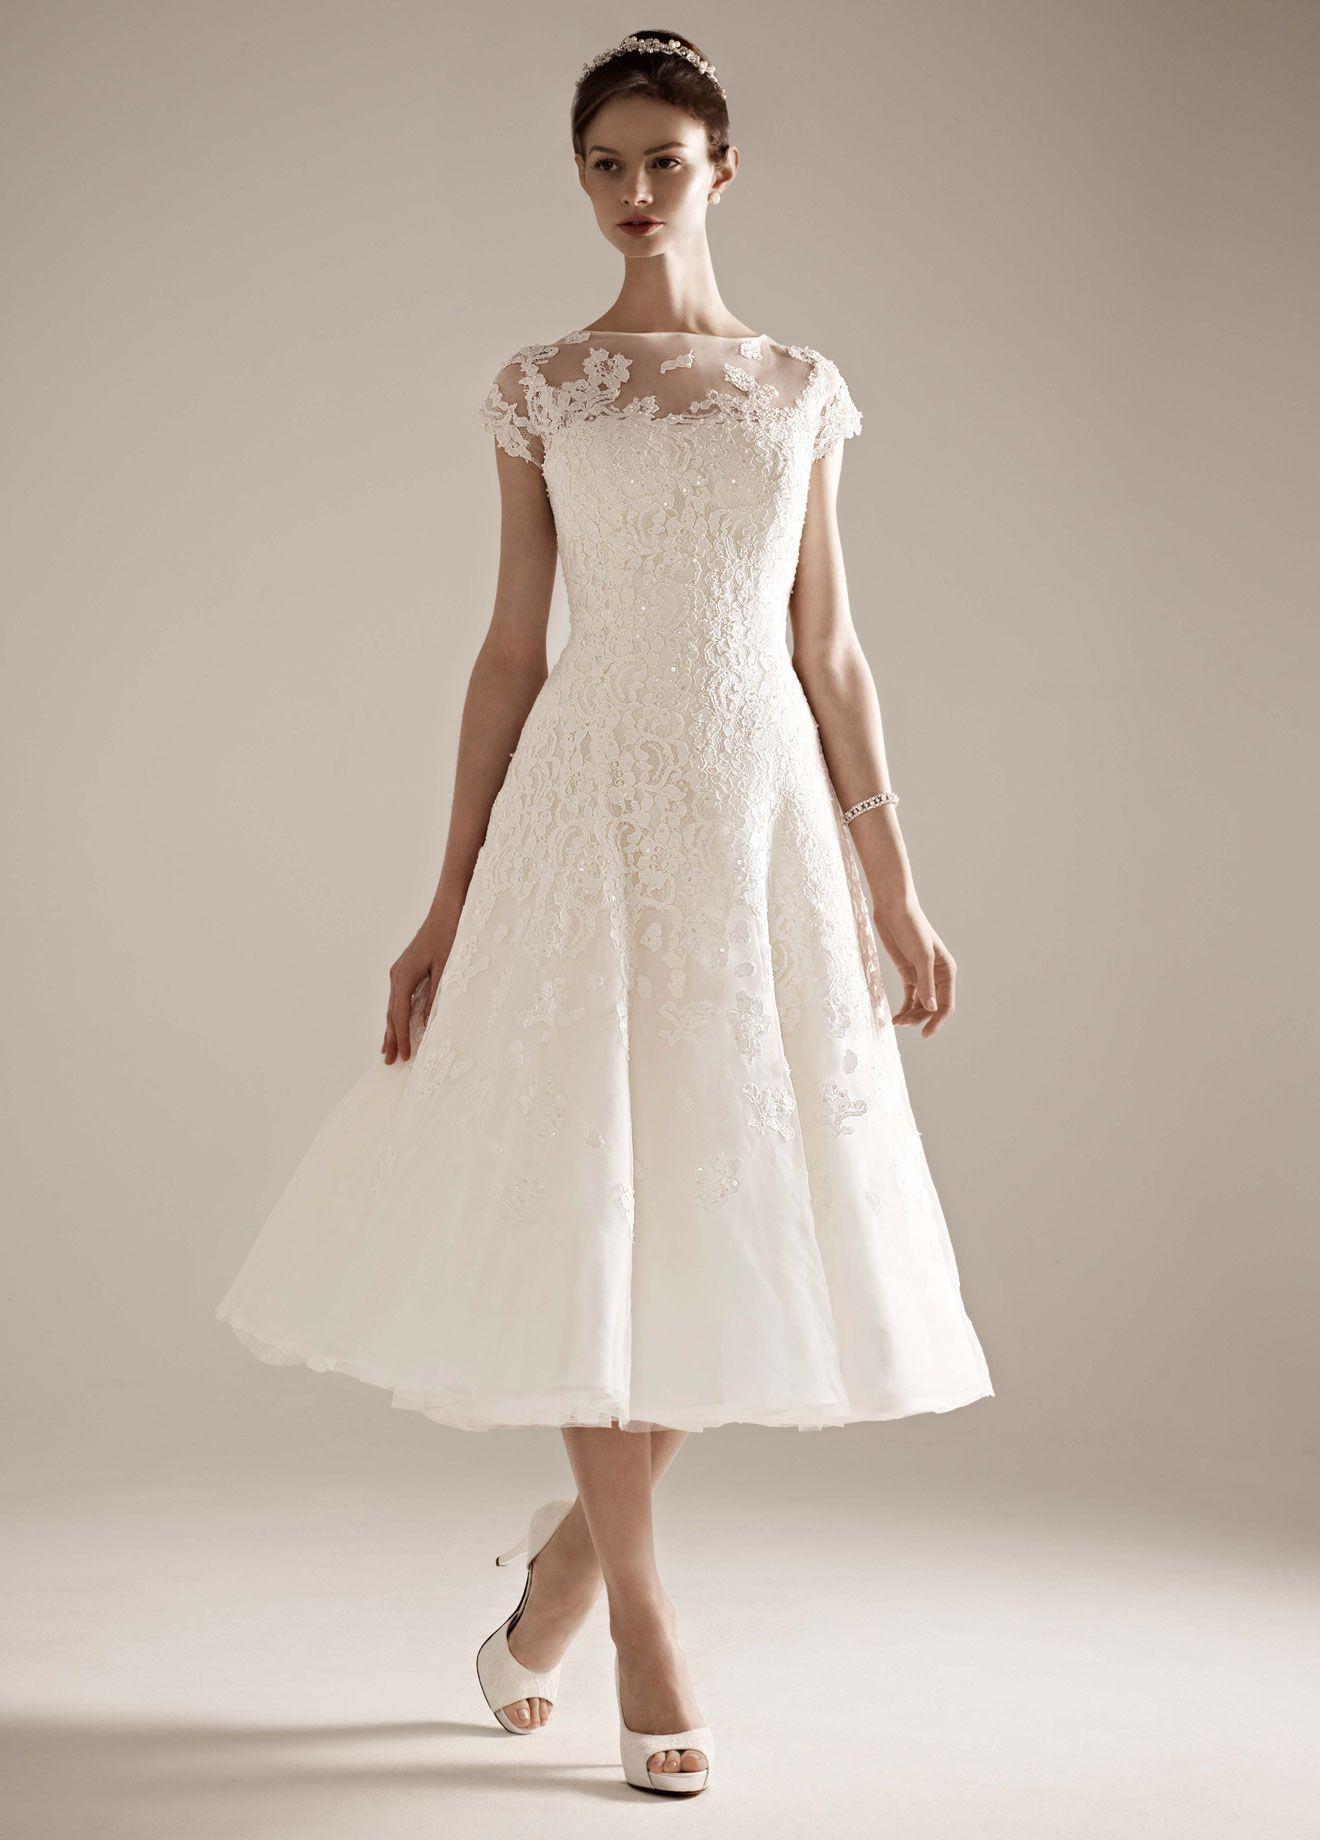 Outdoor Casual Wedding Dresses Photo Ideas | Wedding | Pinterest ...